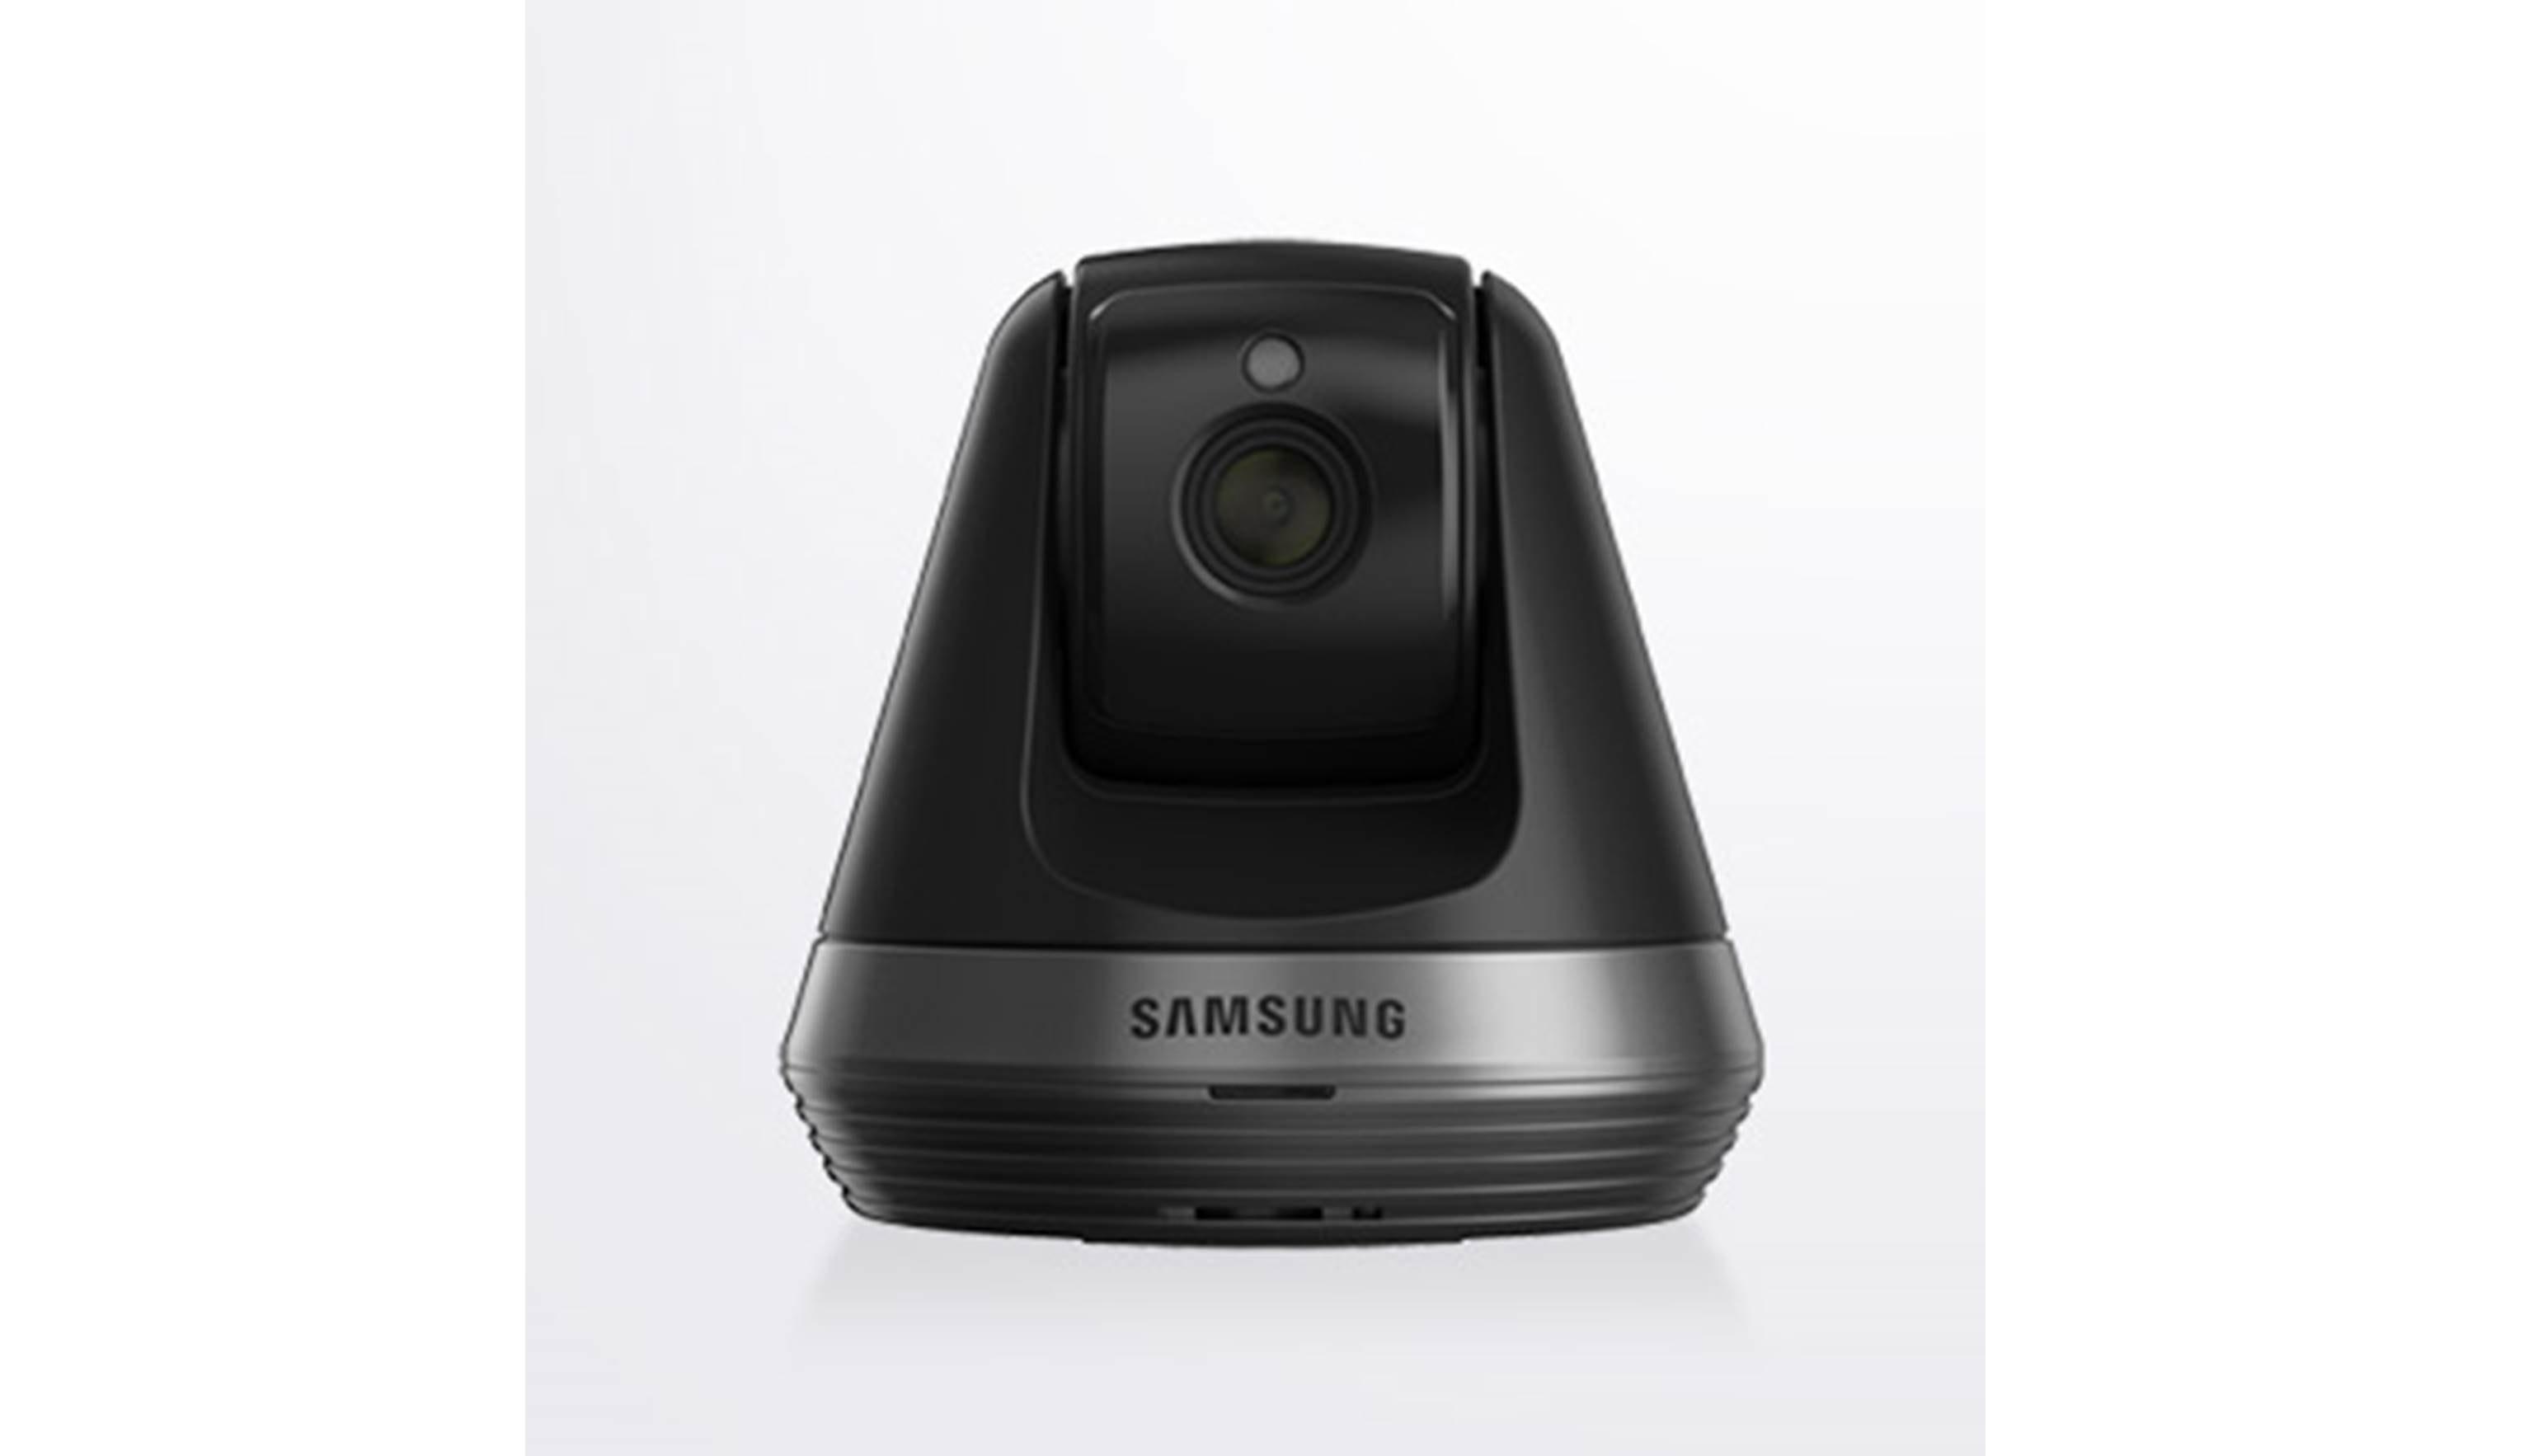 Samsung SNH-V6410PN IP Camera (Front)